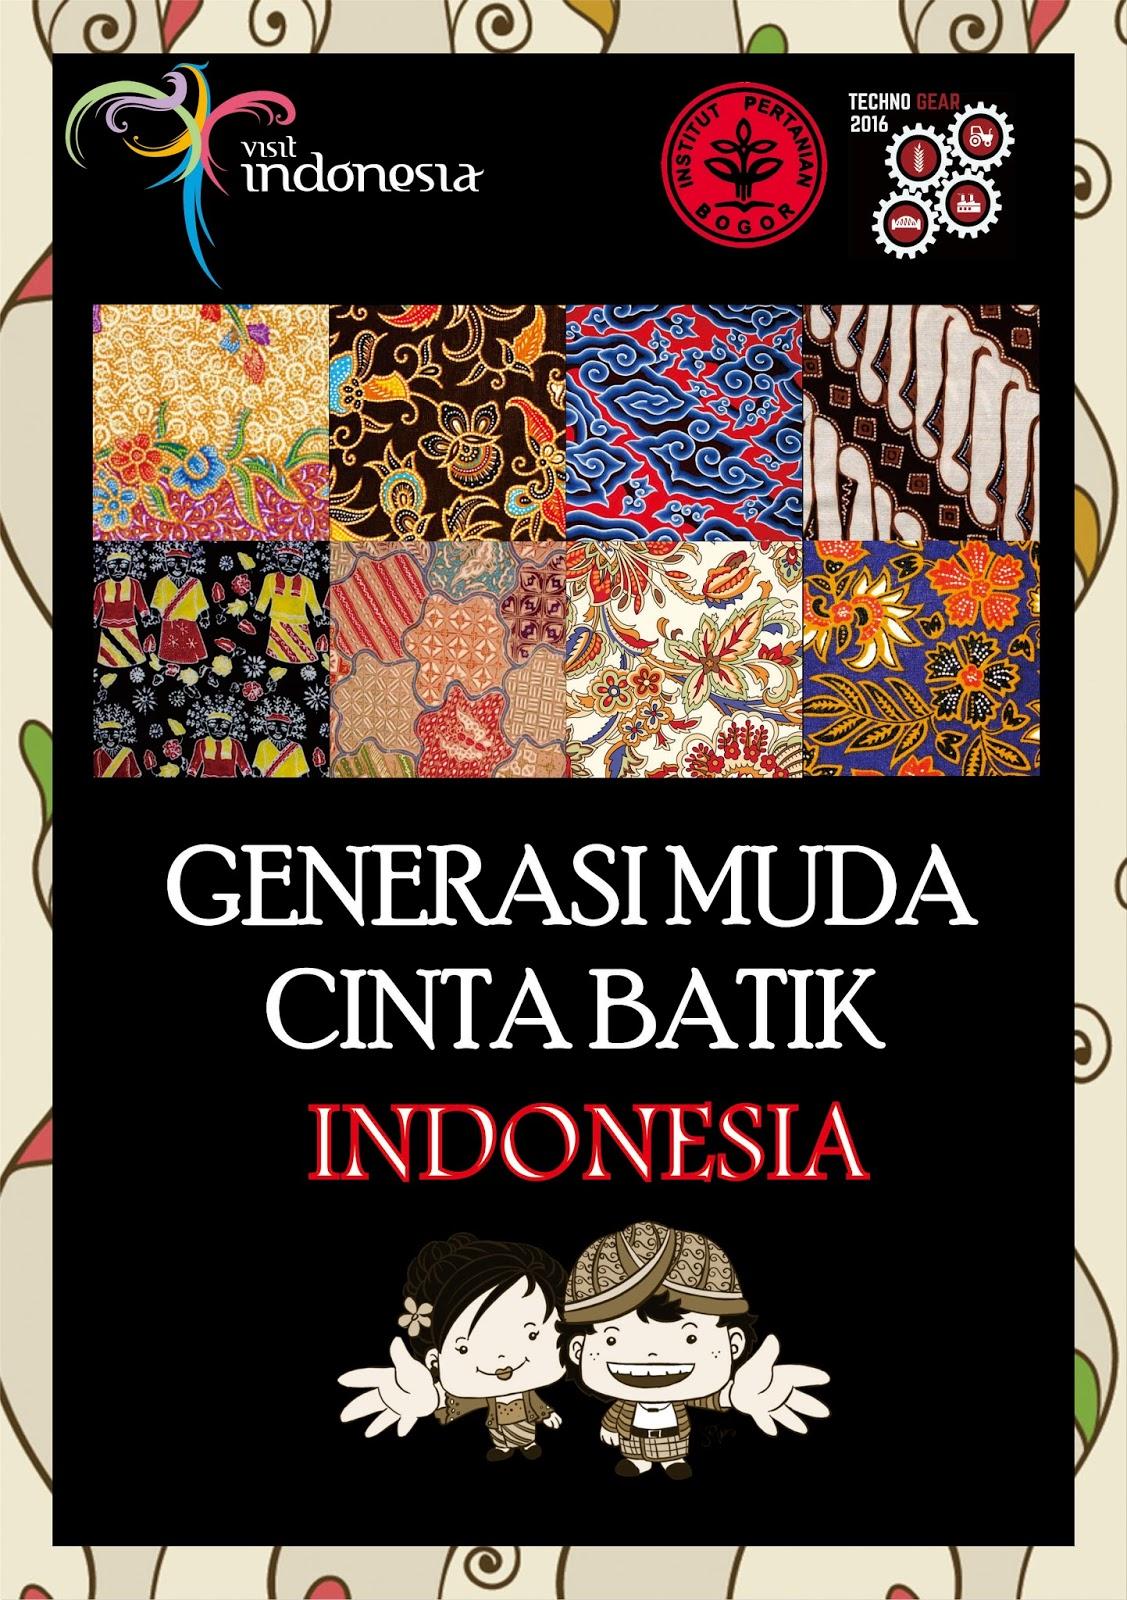 Teknologi Pertanian Poster Aku Padamu Indonesia